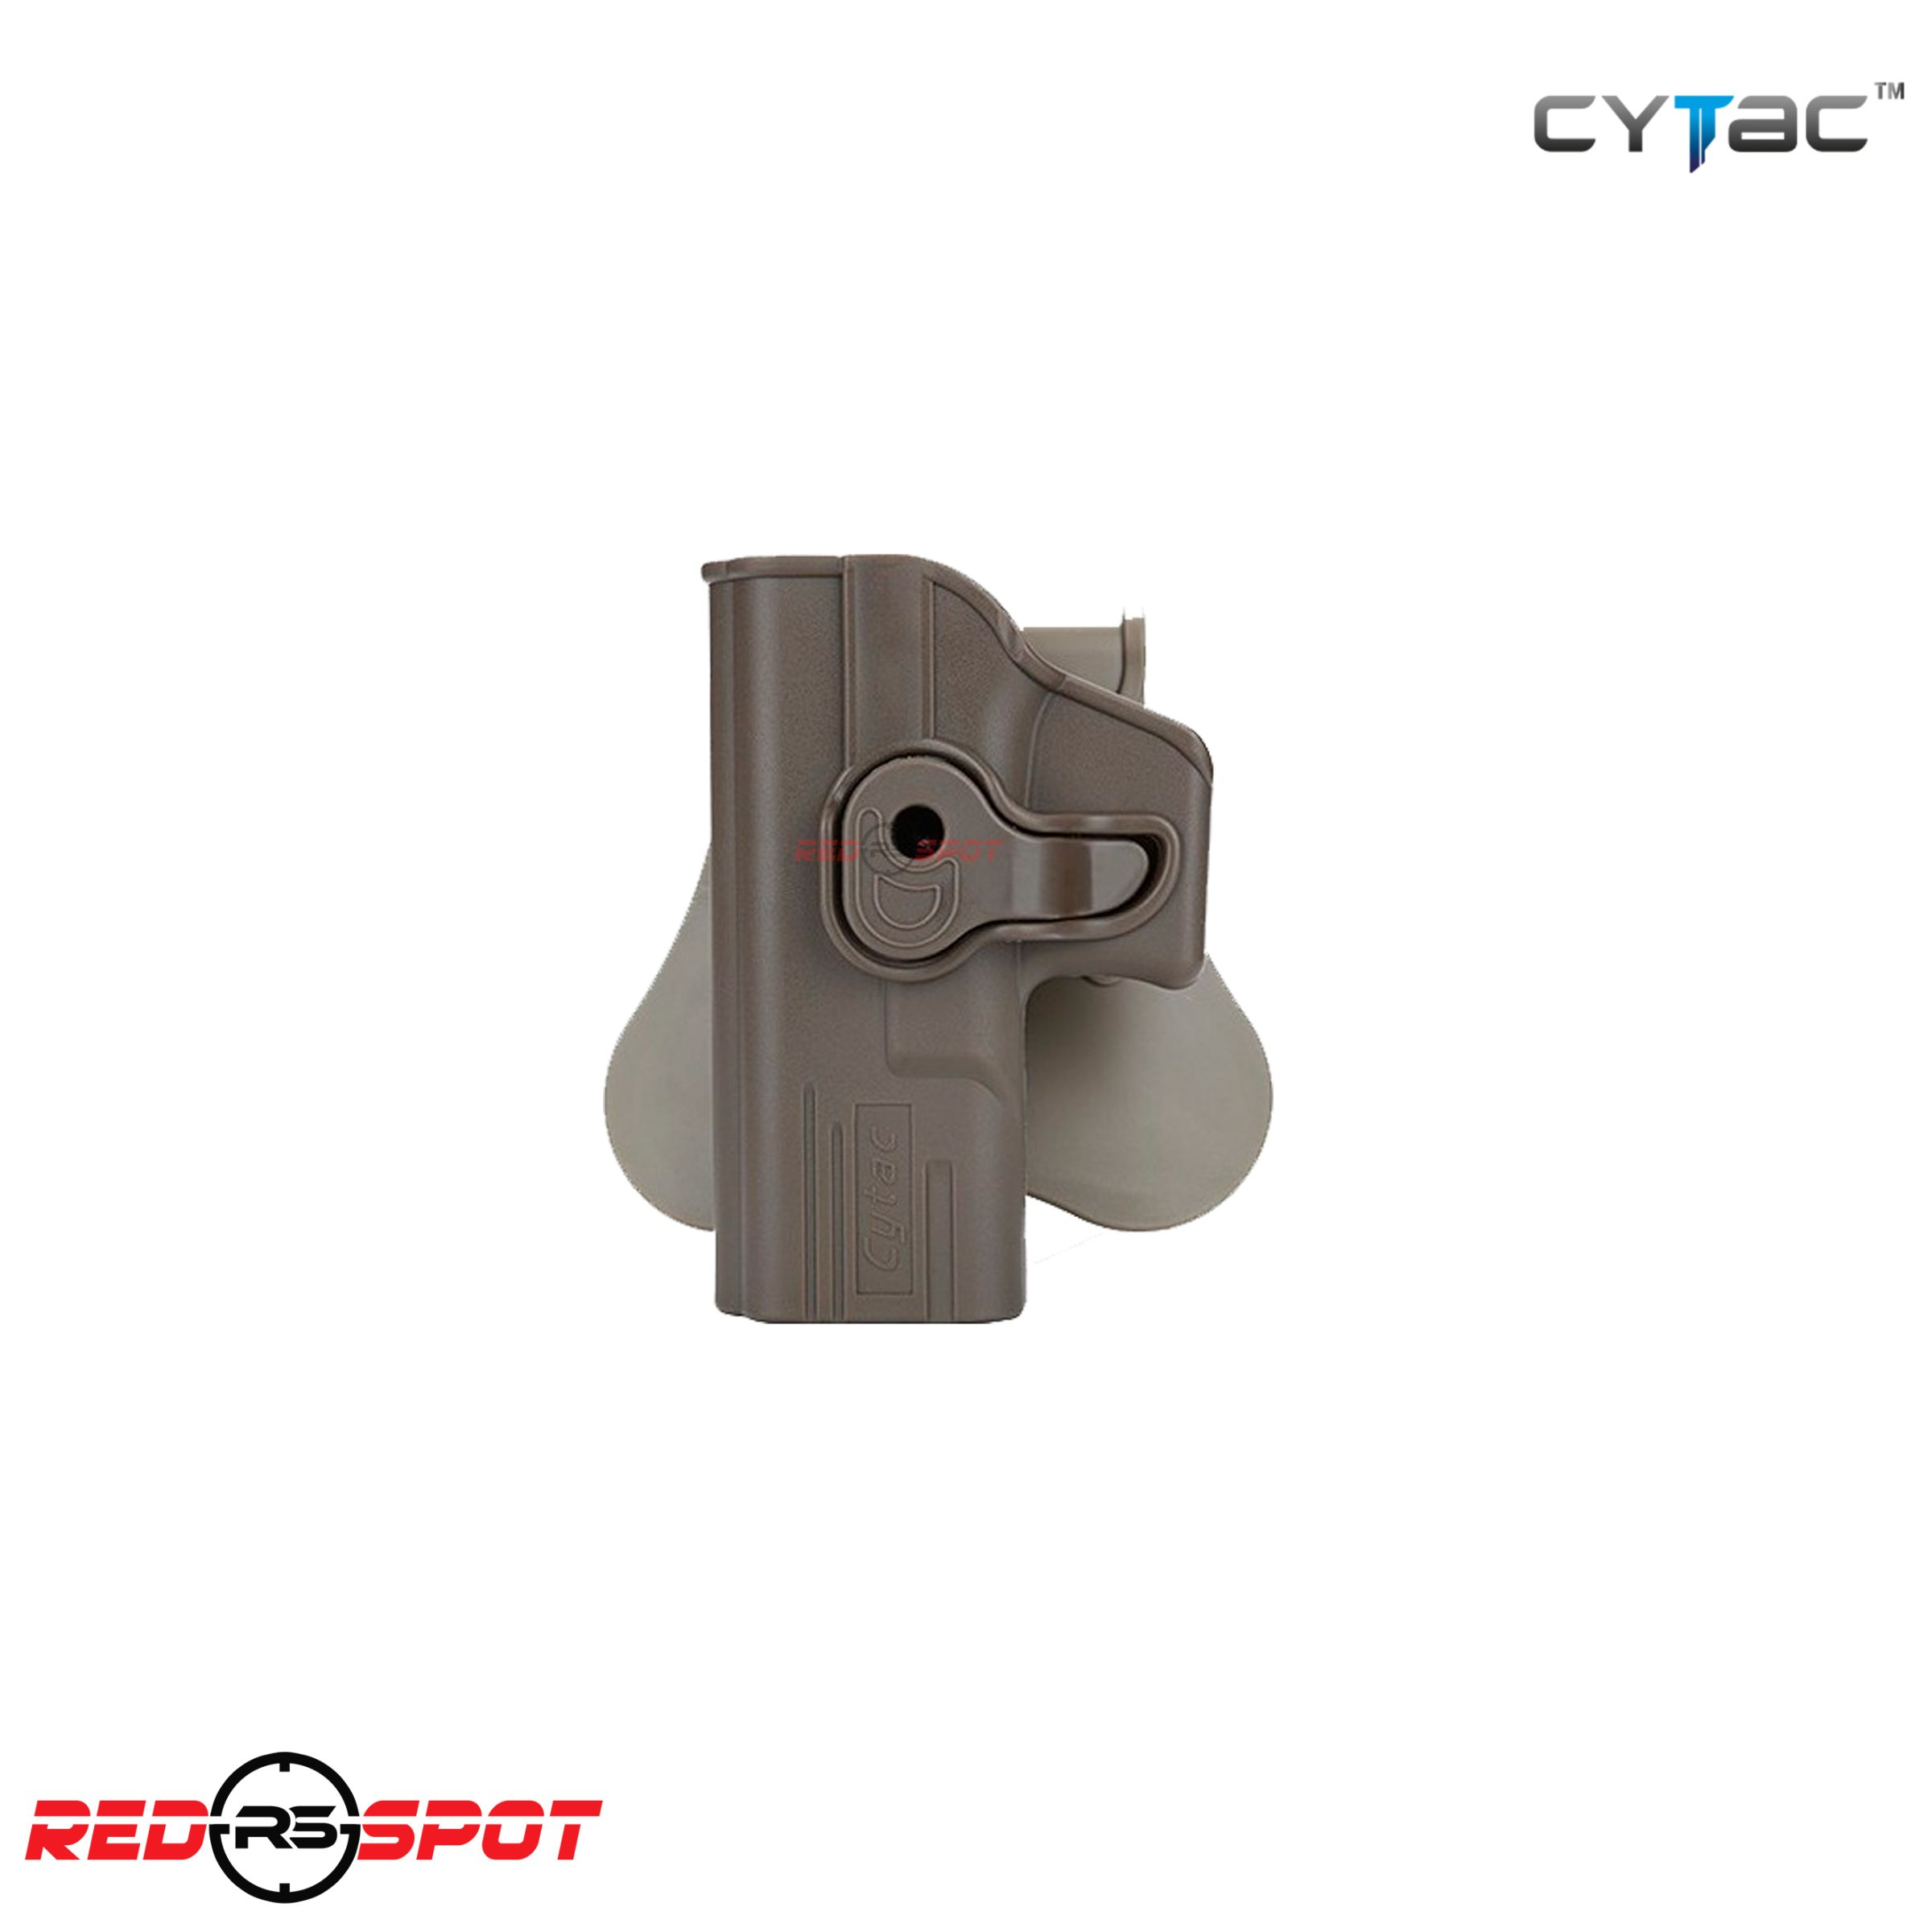 CYTAC HOLSTER GLOCK 19/23/32 ZURDO FDE